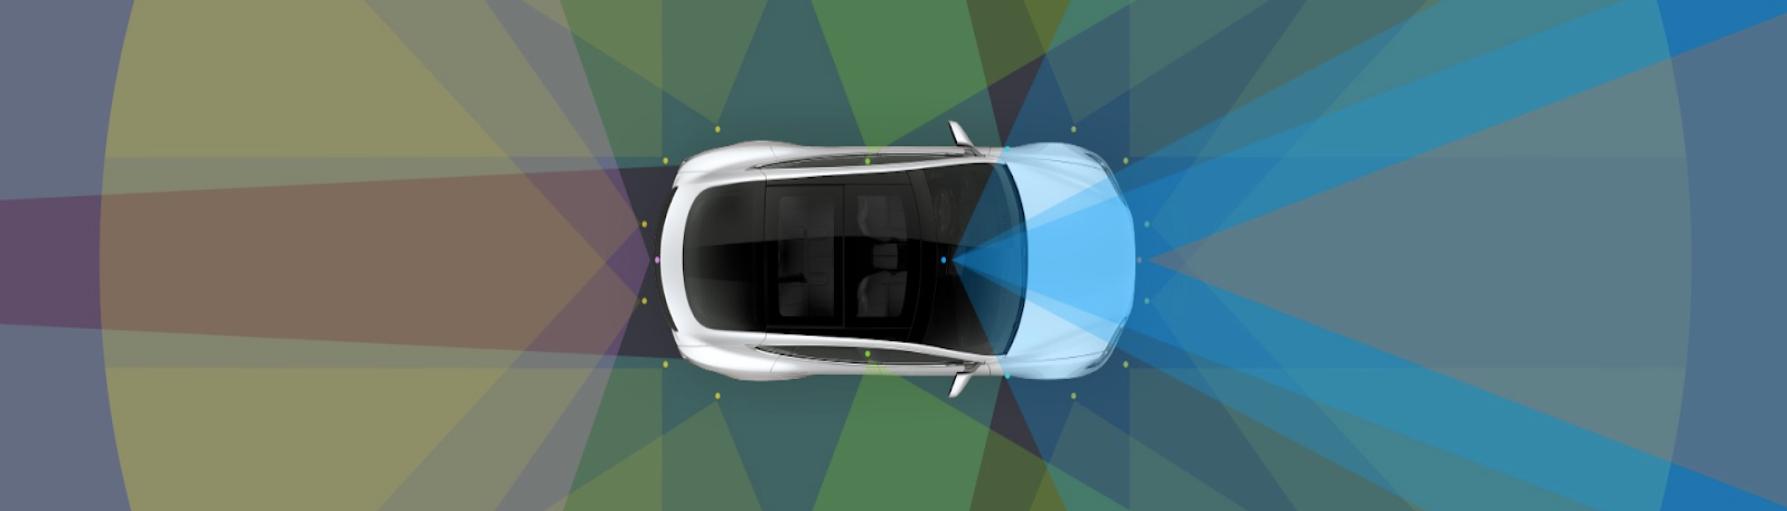 Tesla's Autopilot 2 Sensor Coverage